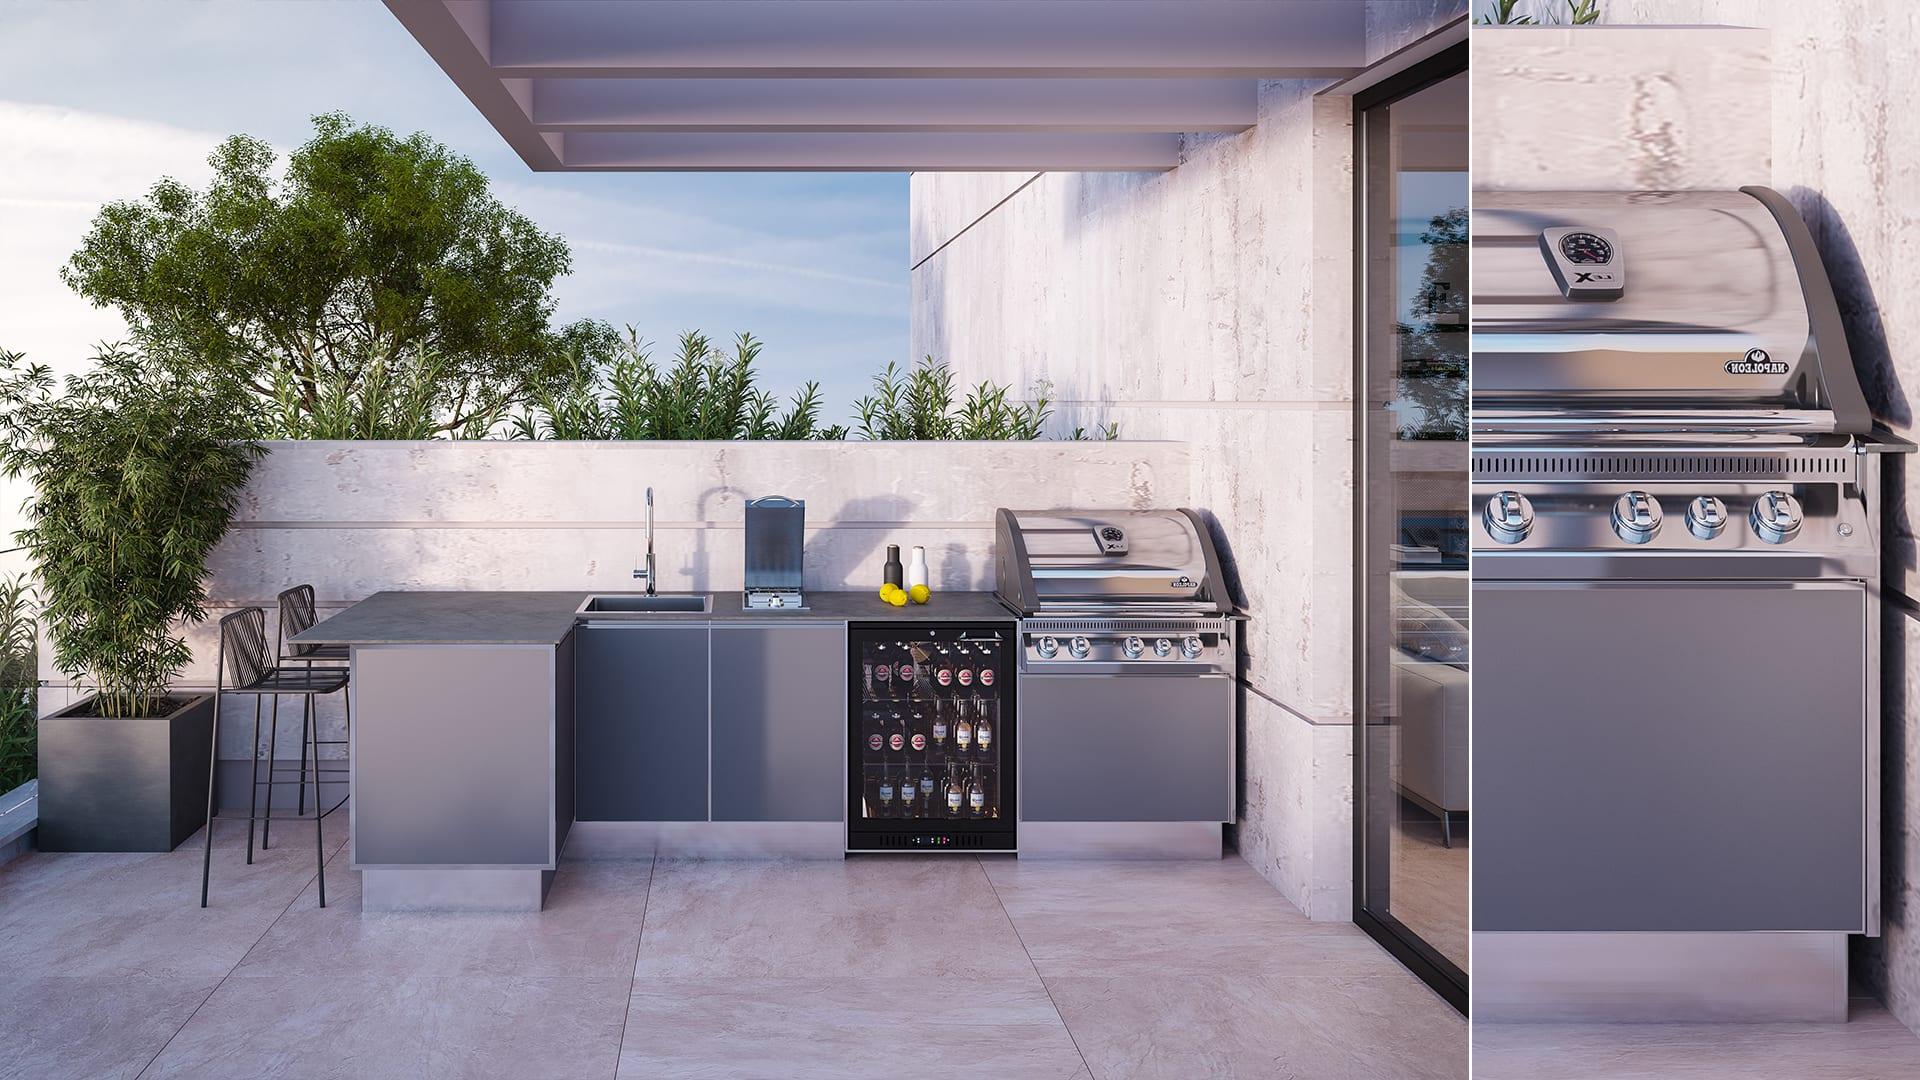 Maayan-Golan_Architectural-Visualization_product-visualization_outdoor-kitchen_alumex-by-formex_hatzbani-kitchen_02